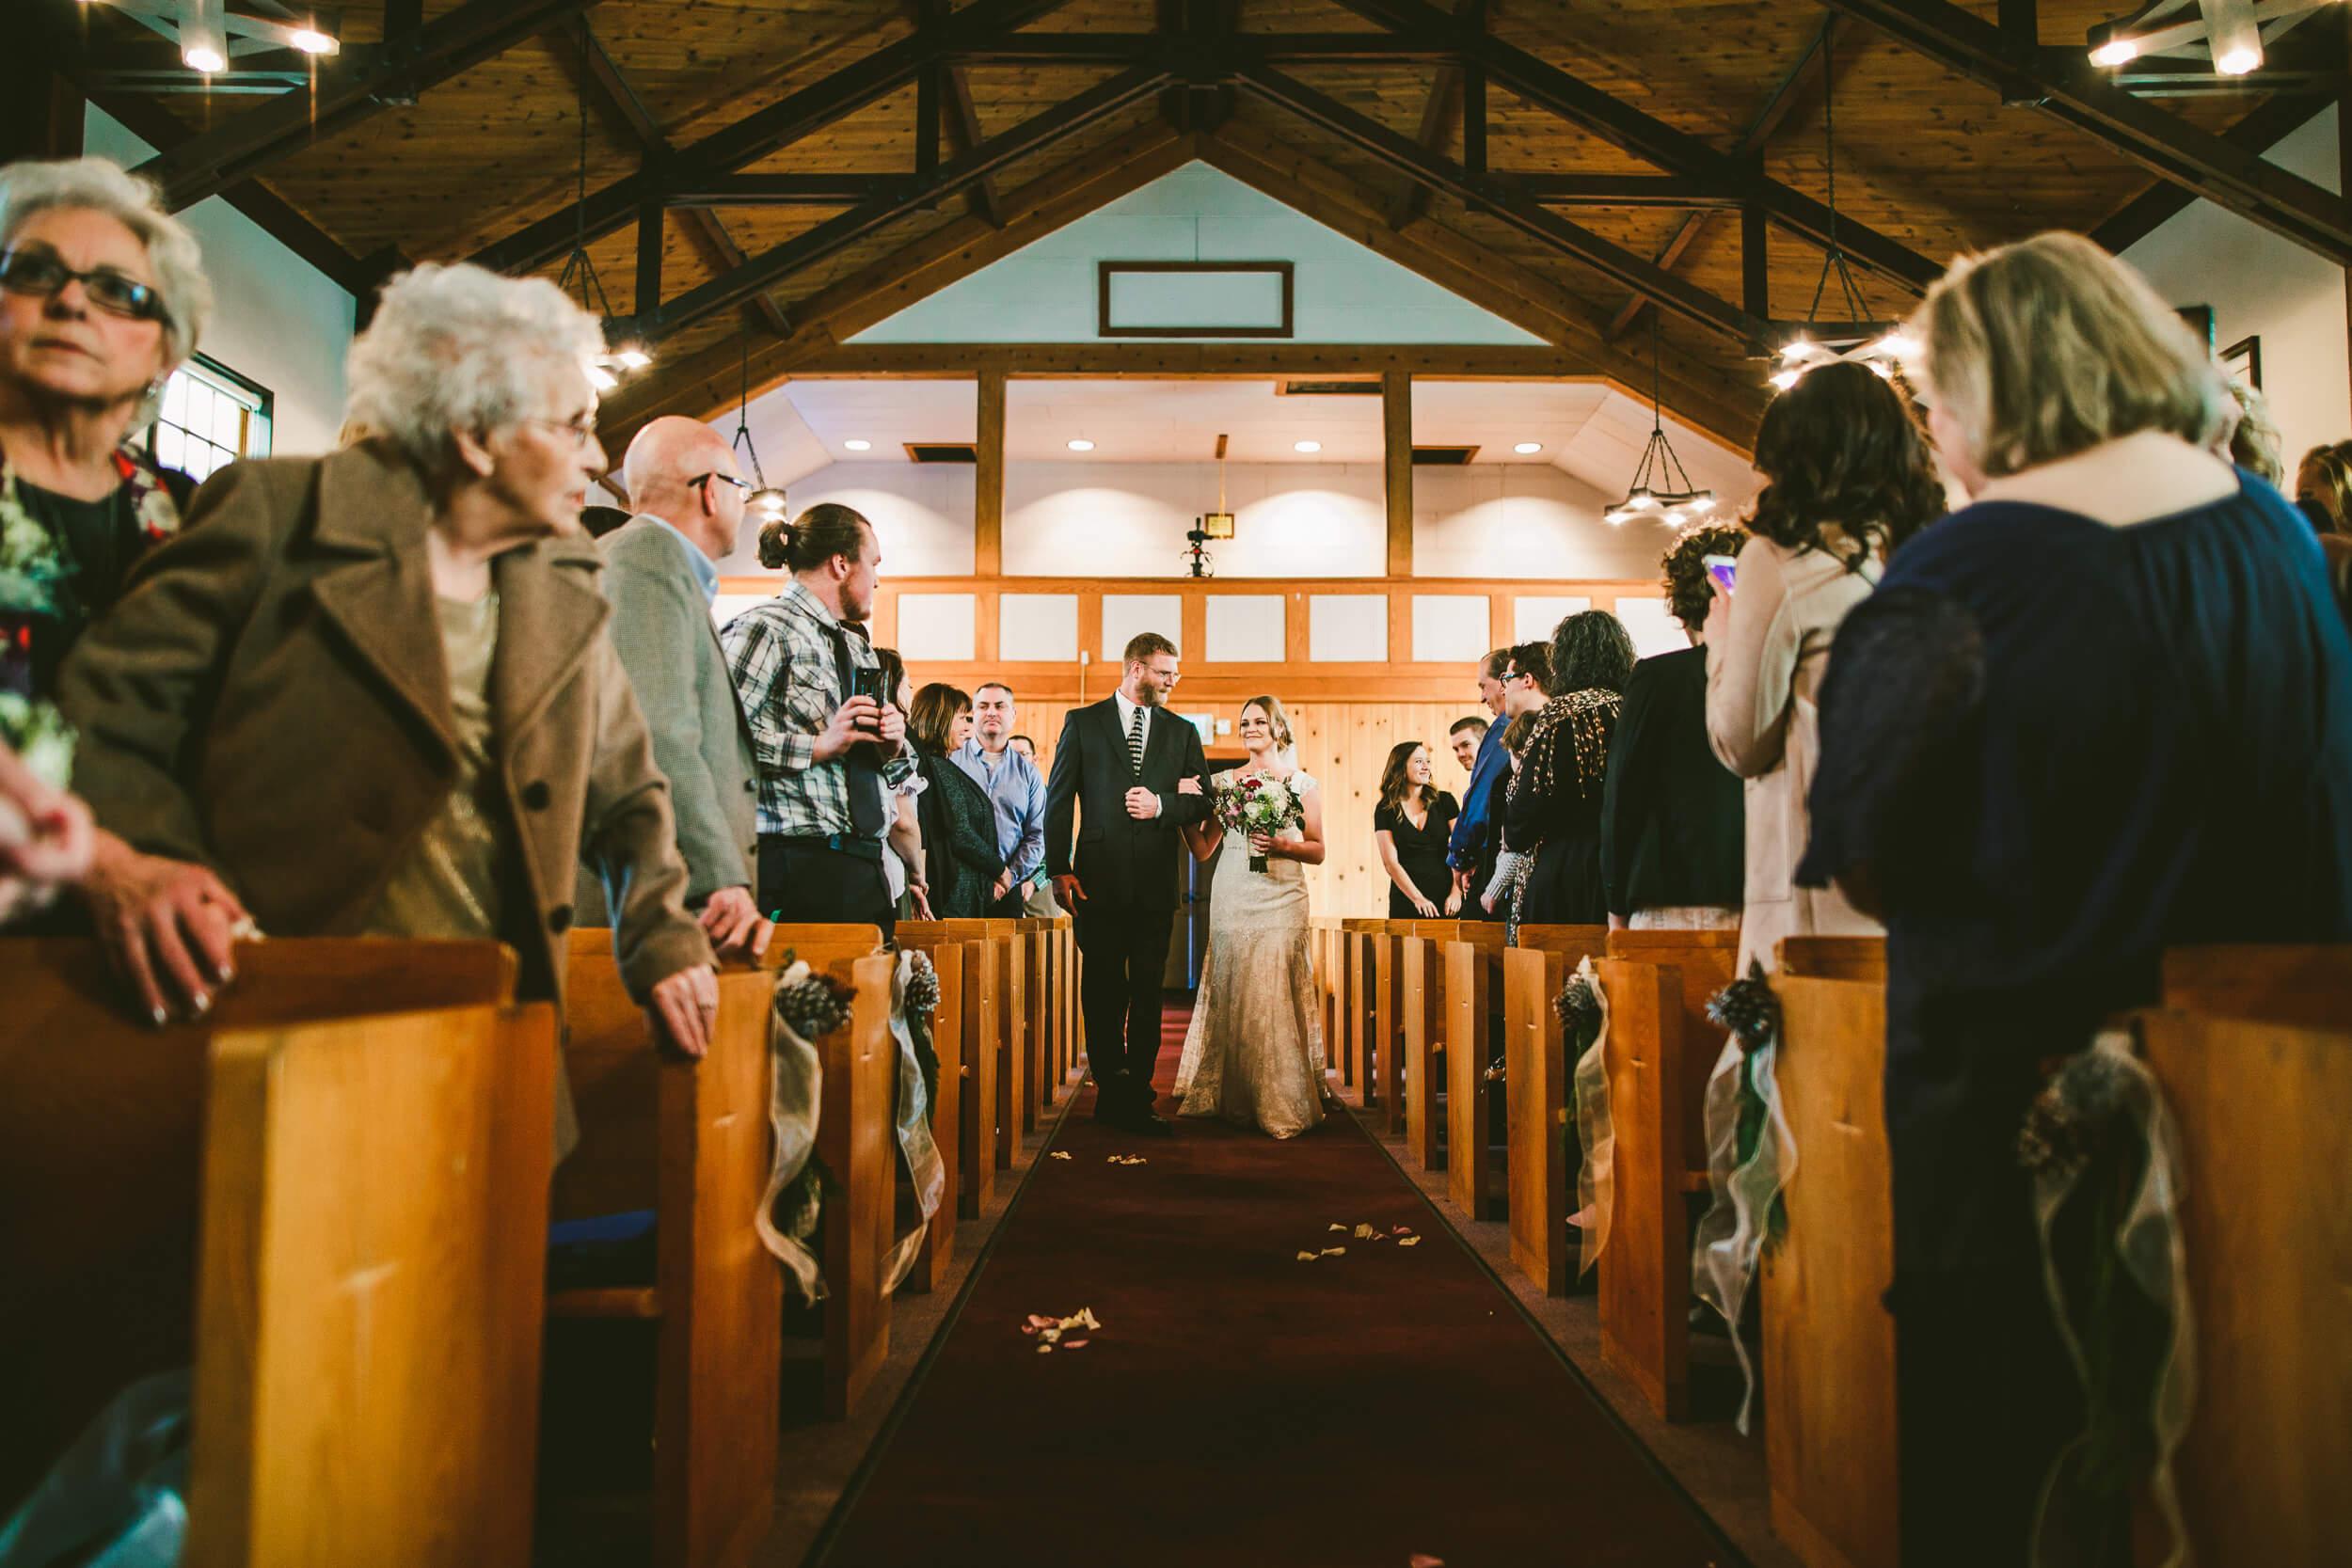 mukogawa winter wedding in spokane (150).jpg